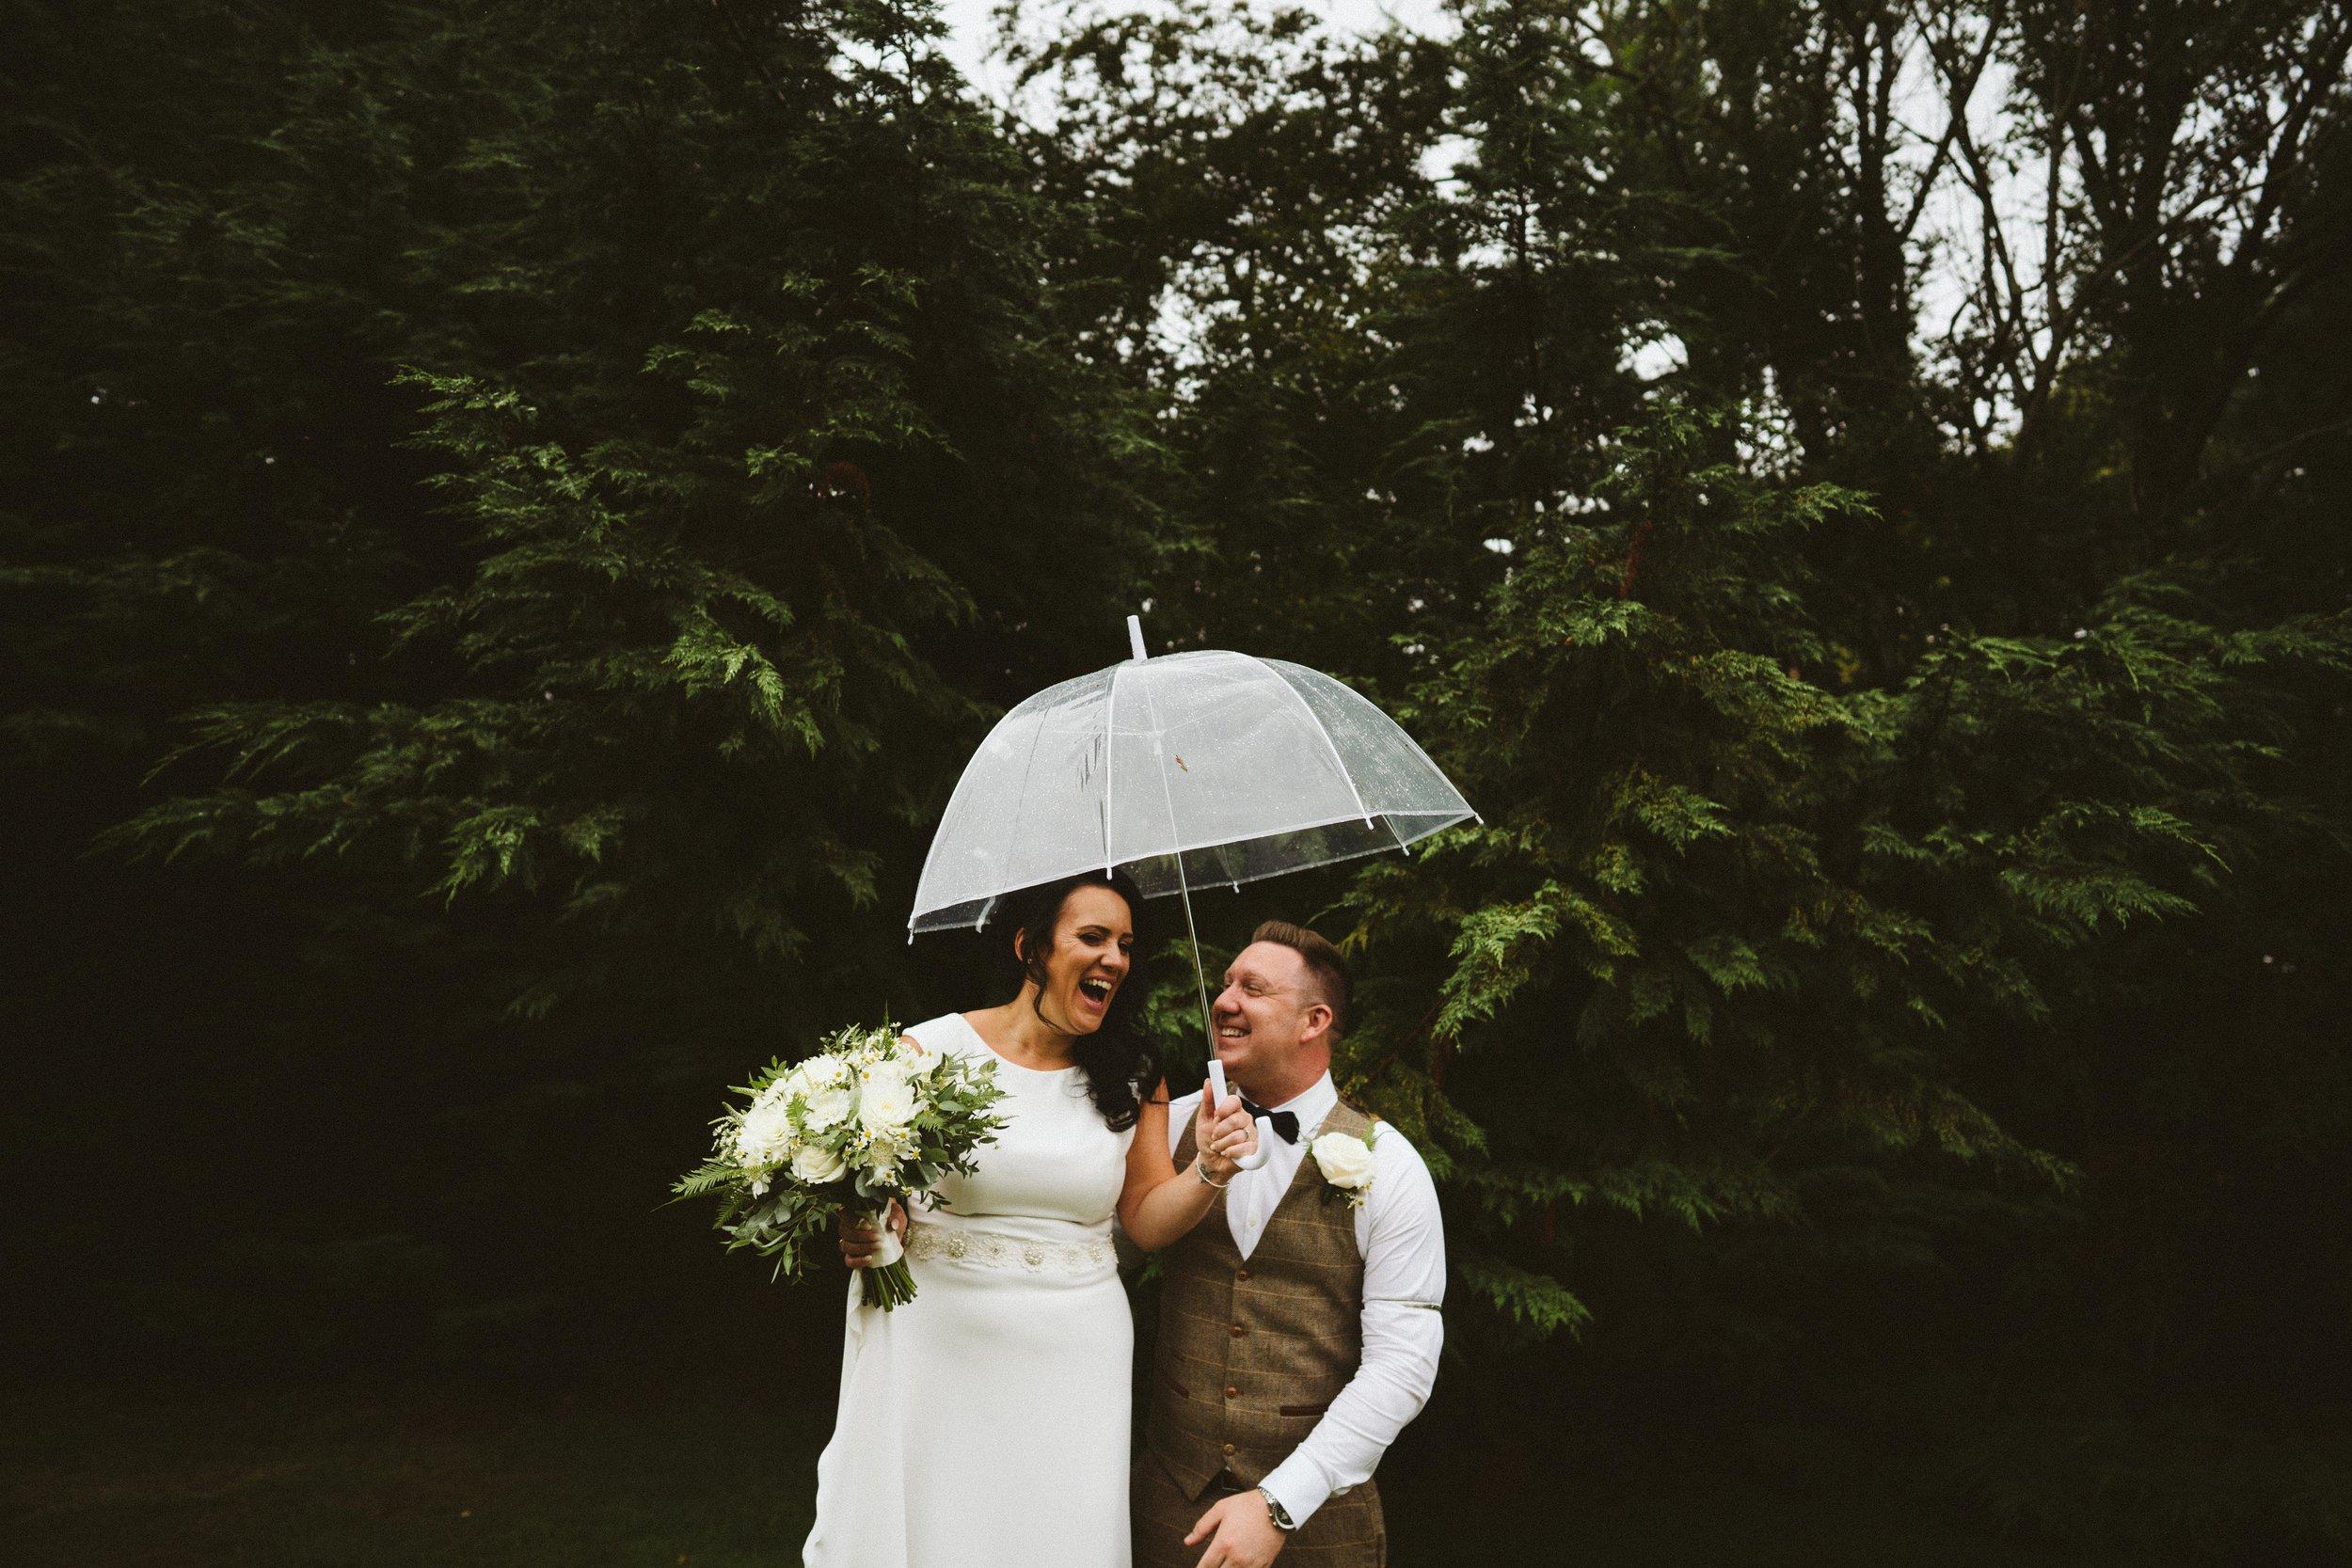 kent-wedding-photographer-05497.jpg